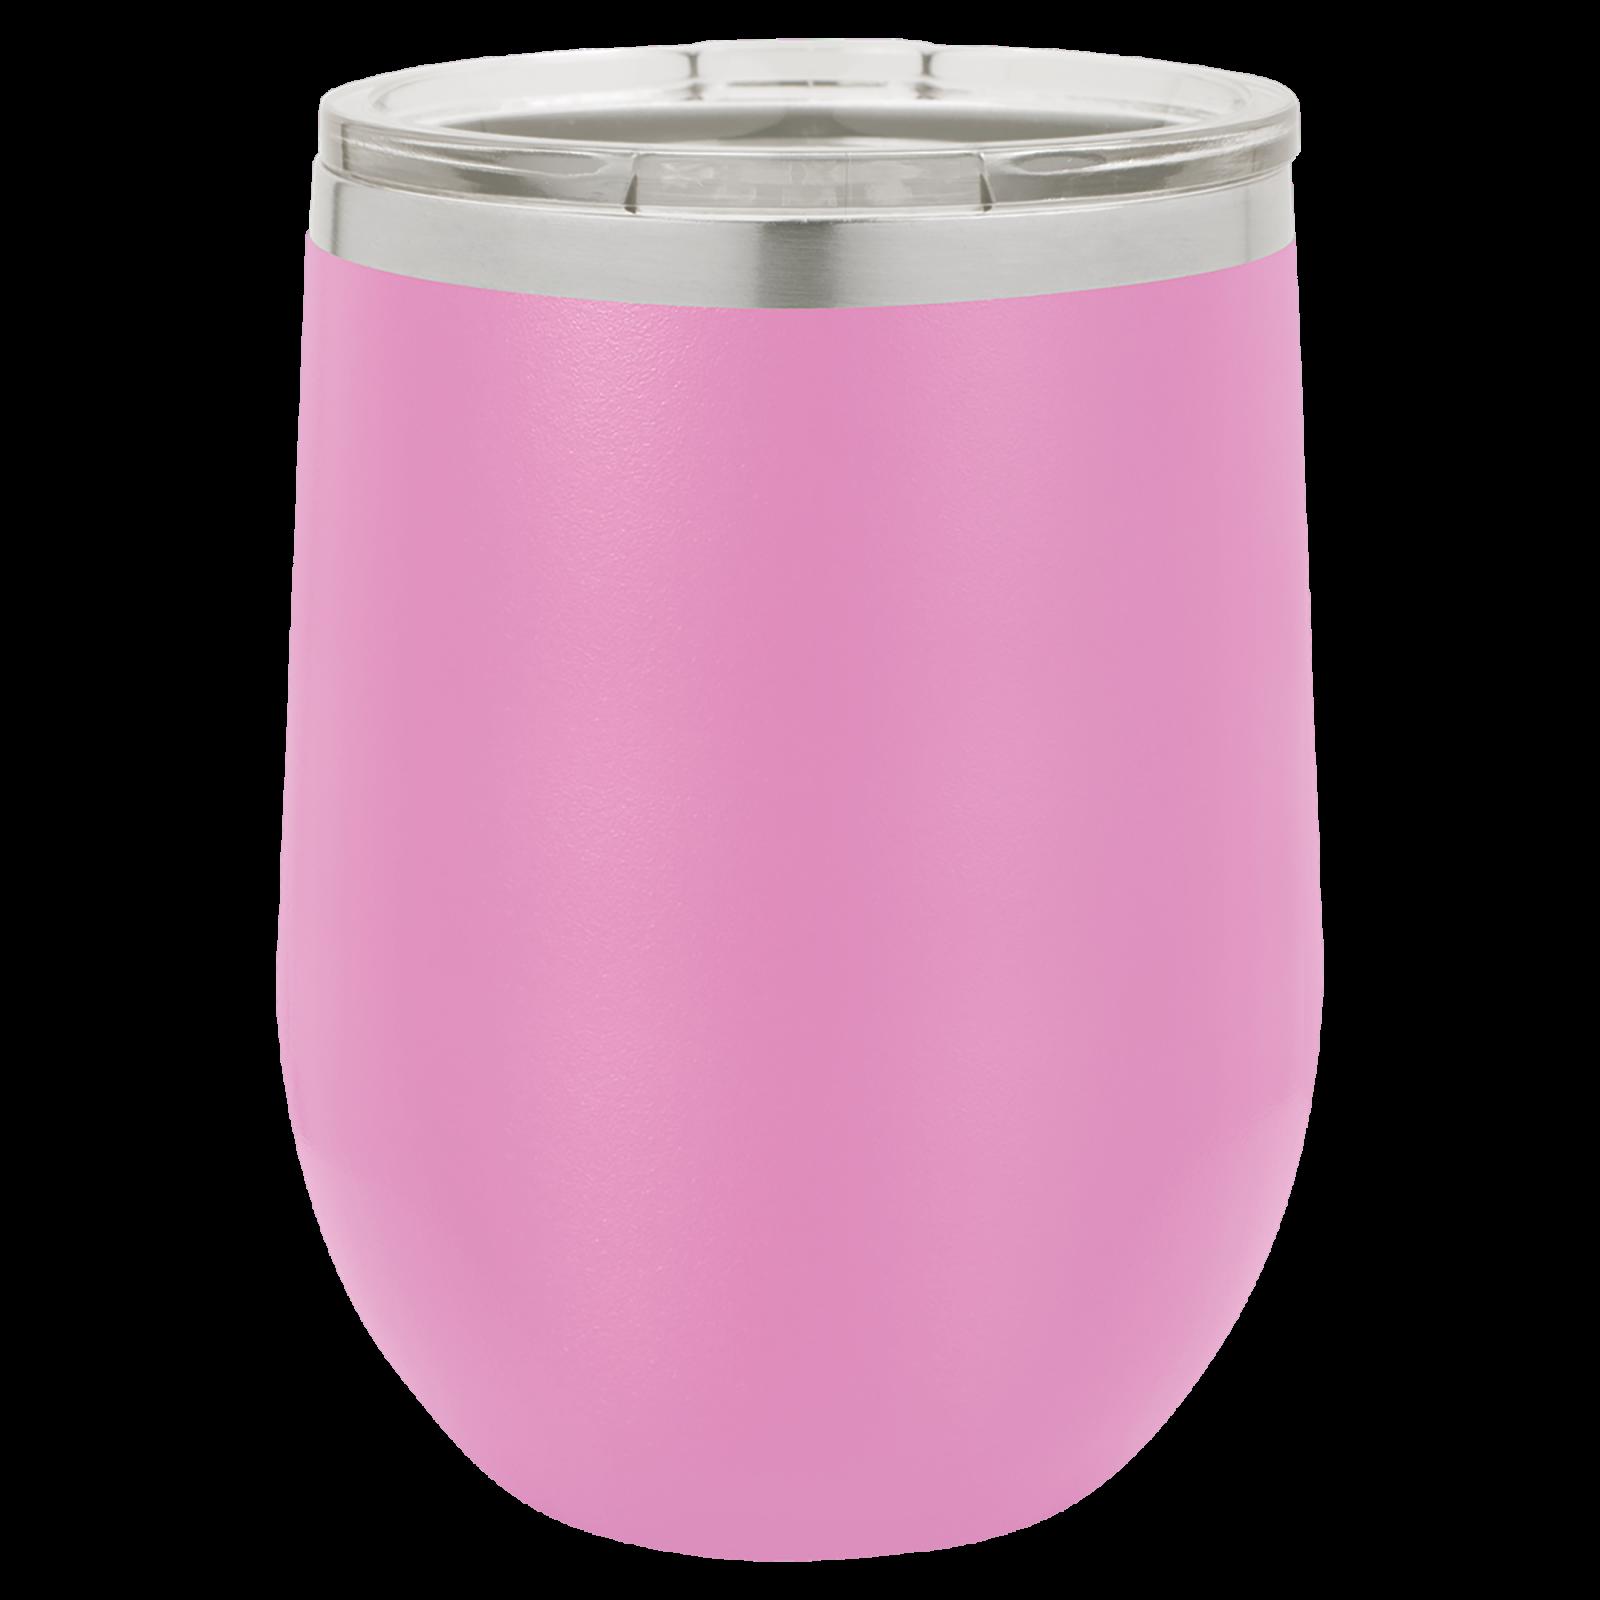 12 oz Stemless Wine cups LIGHT PURPLE